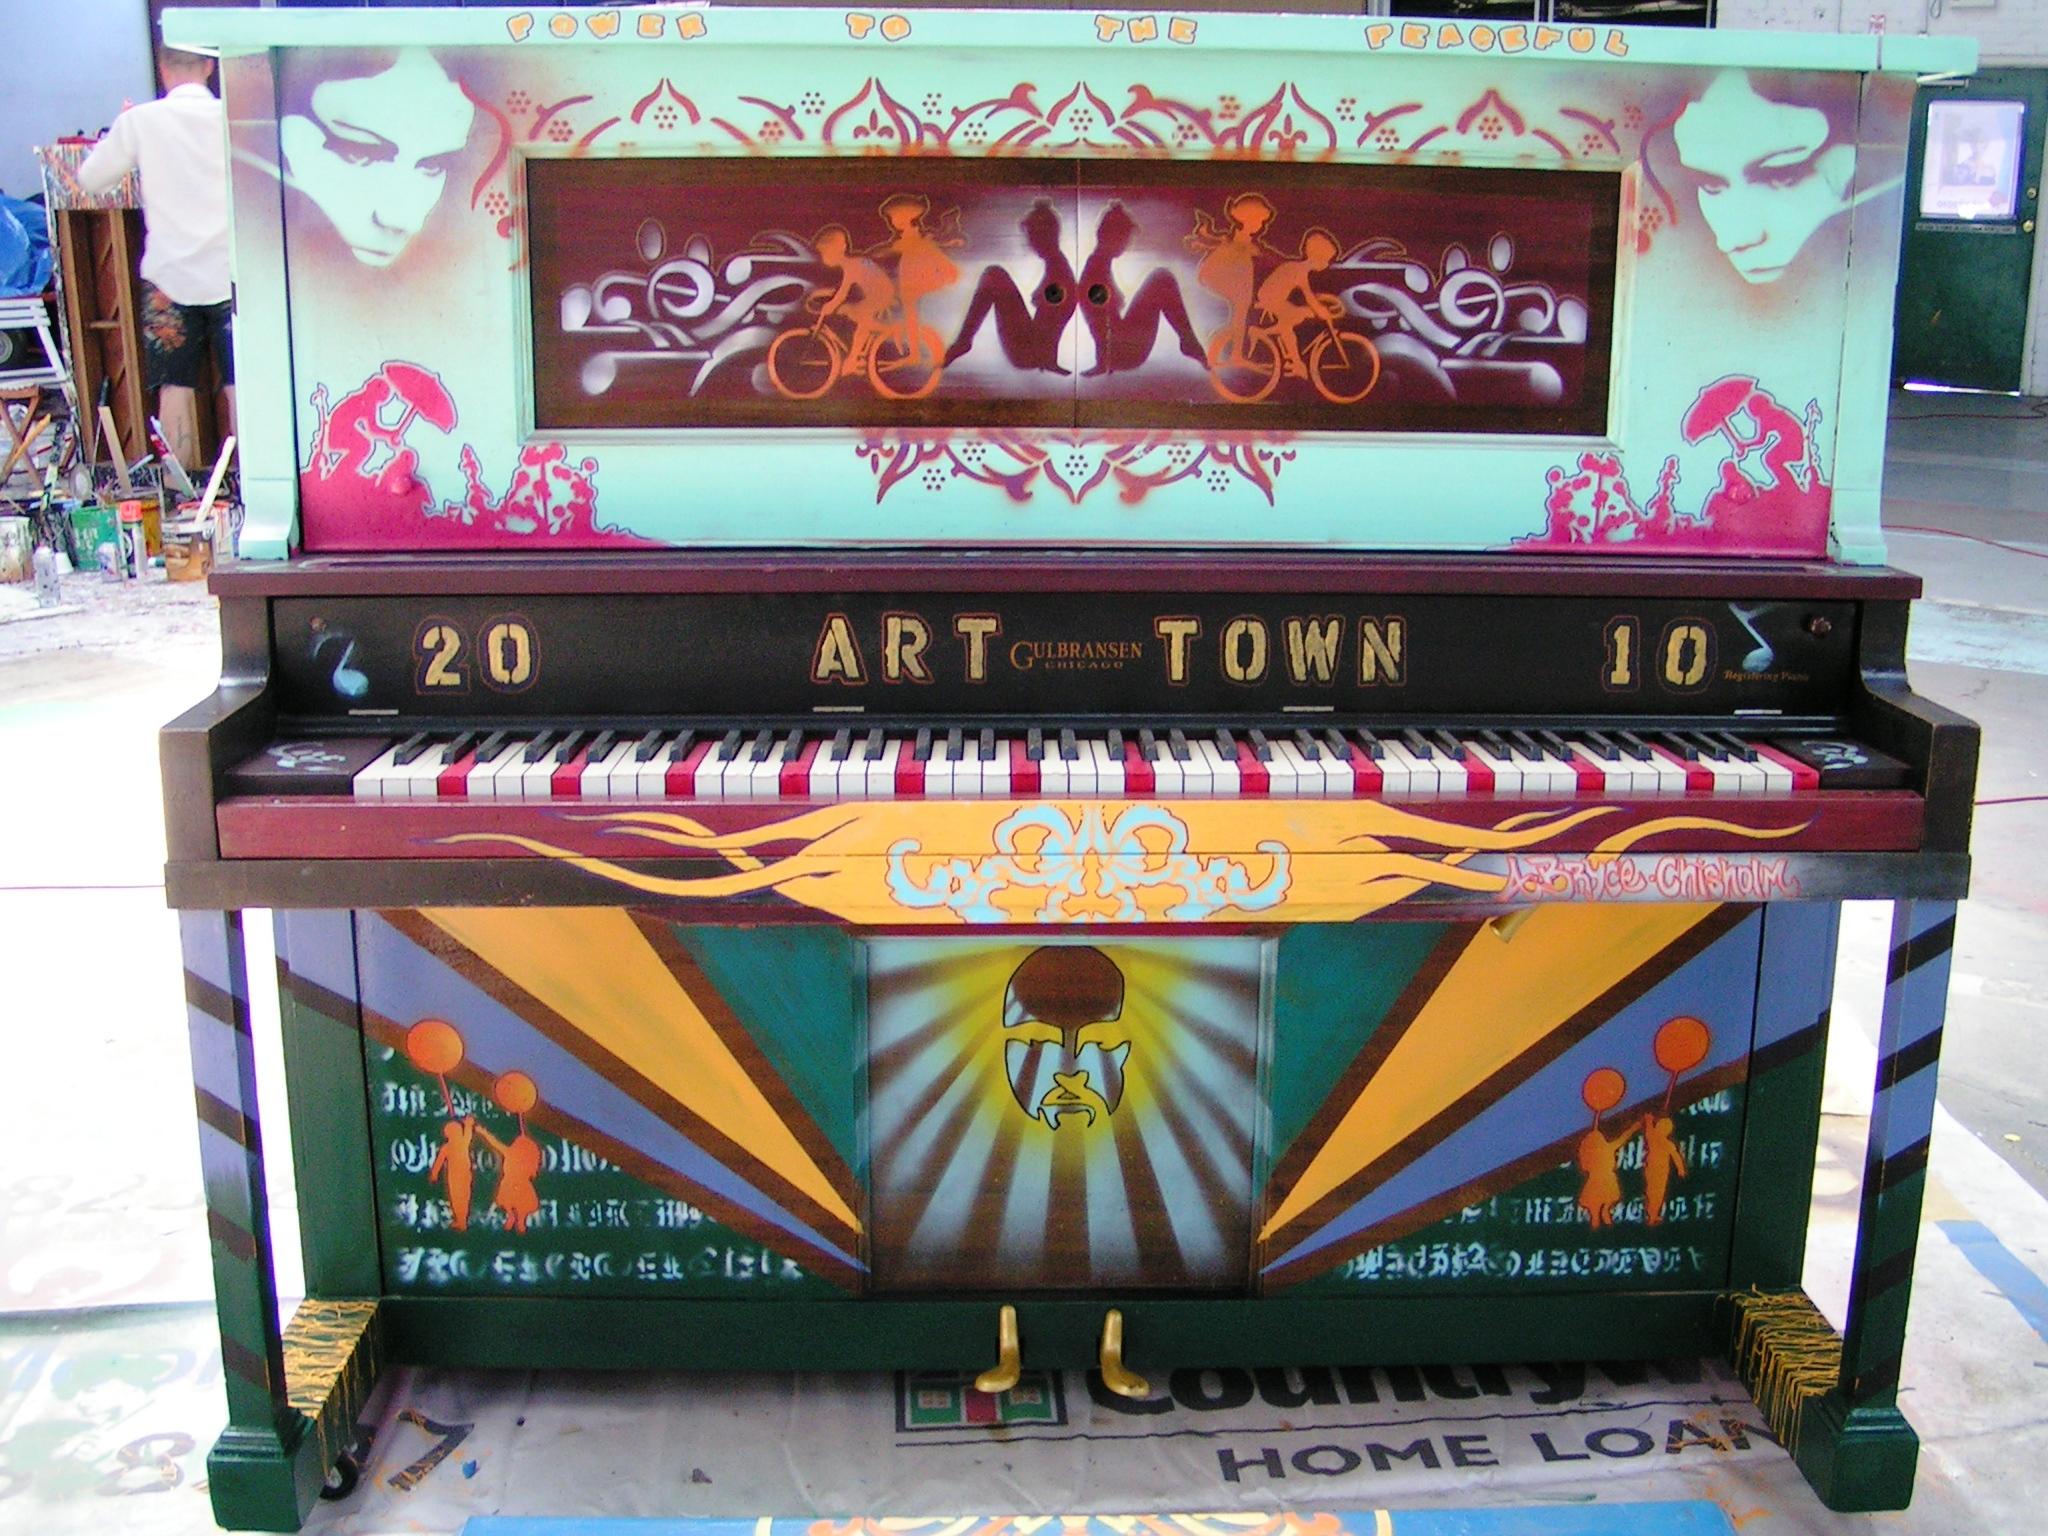 Reno Art Town rePiano1.JPG